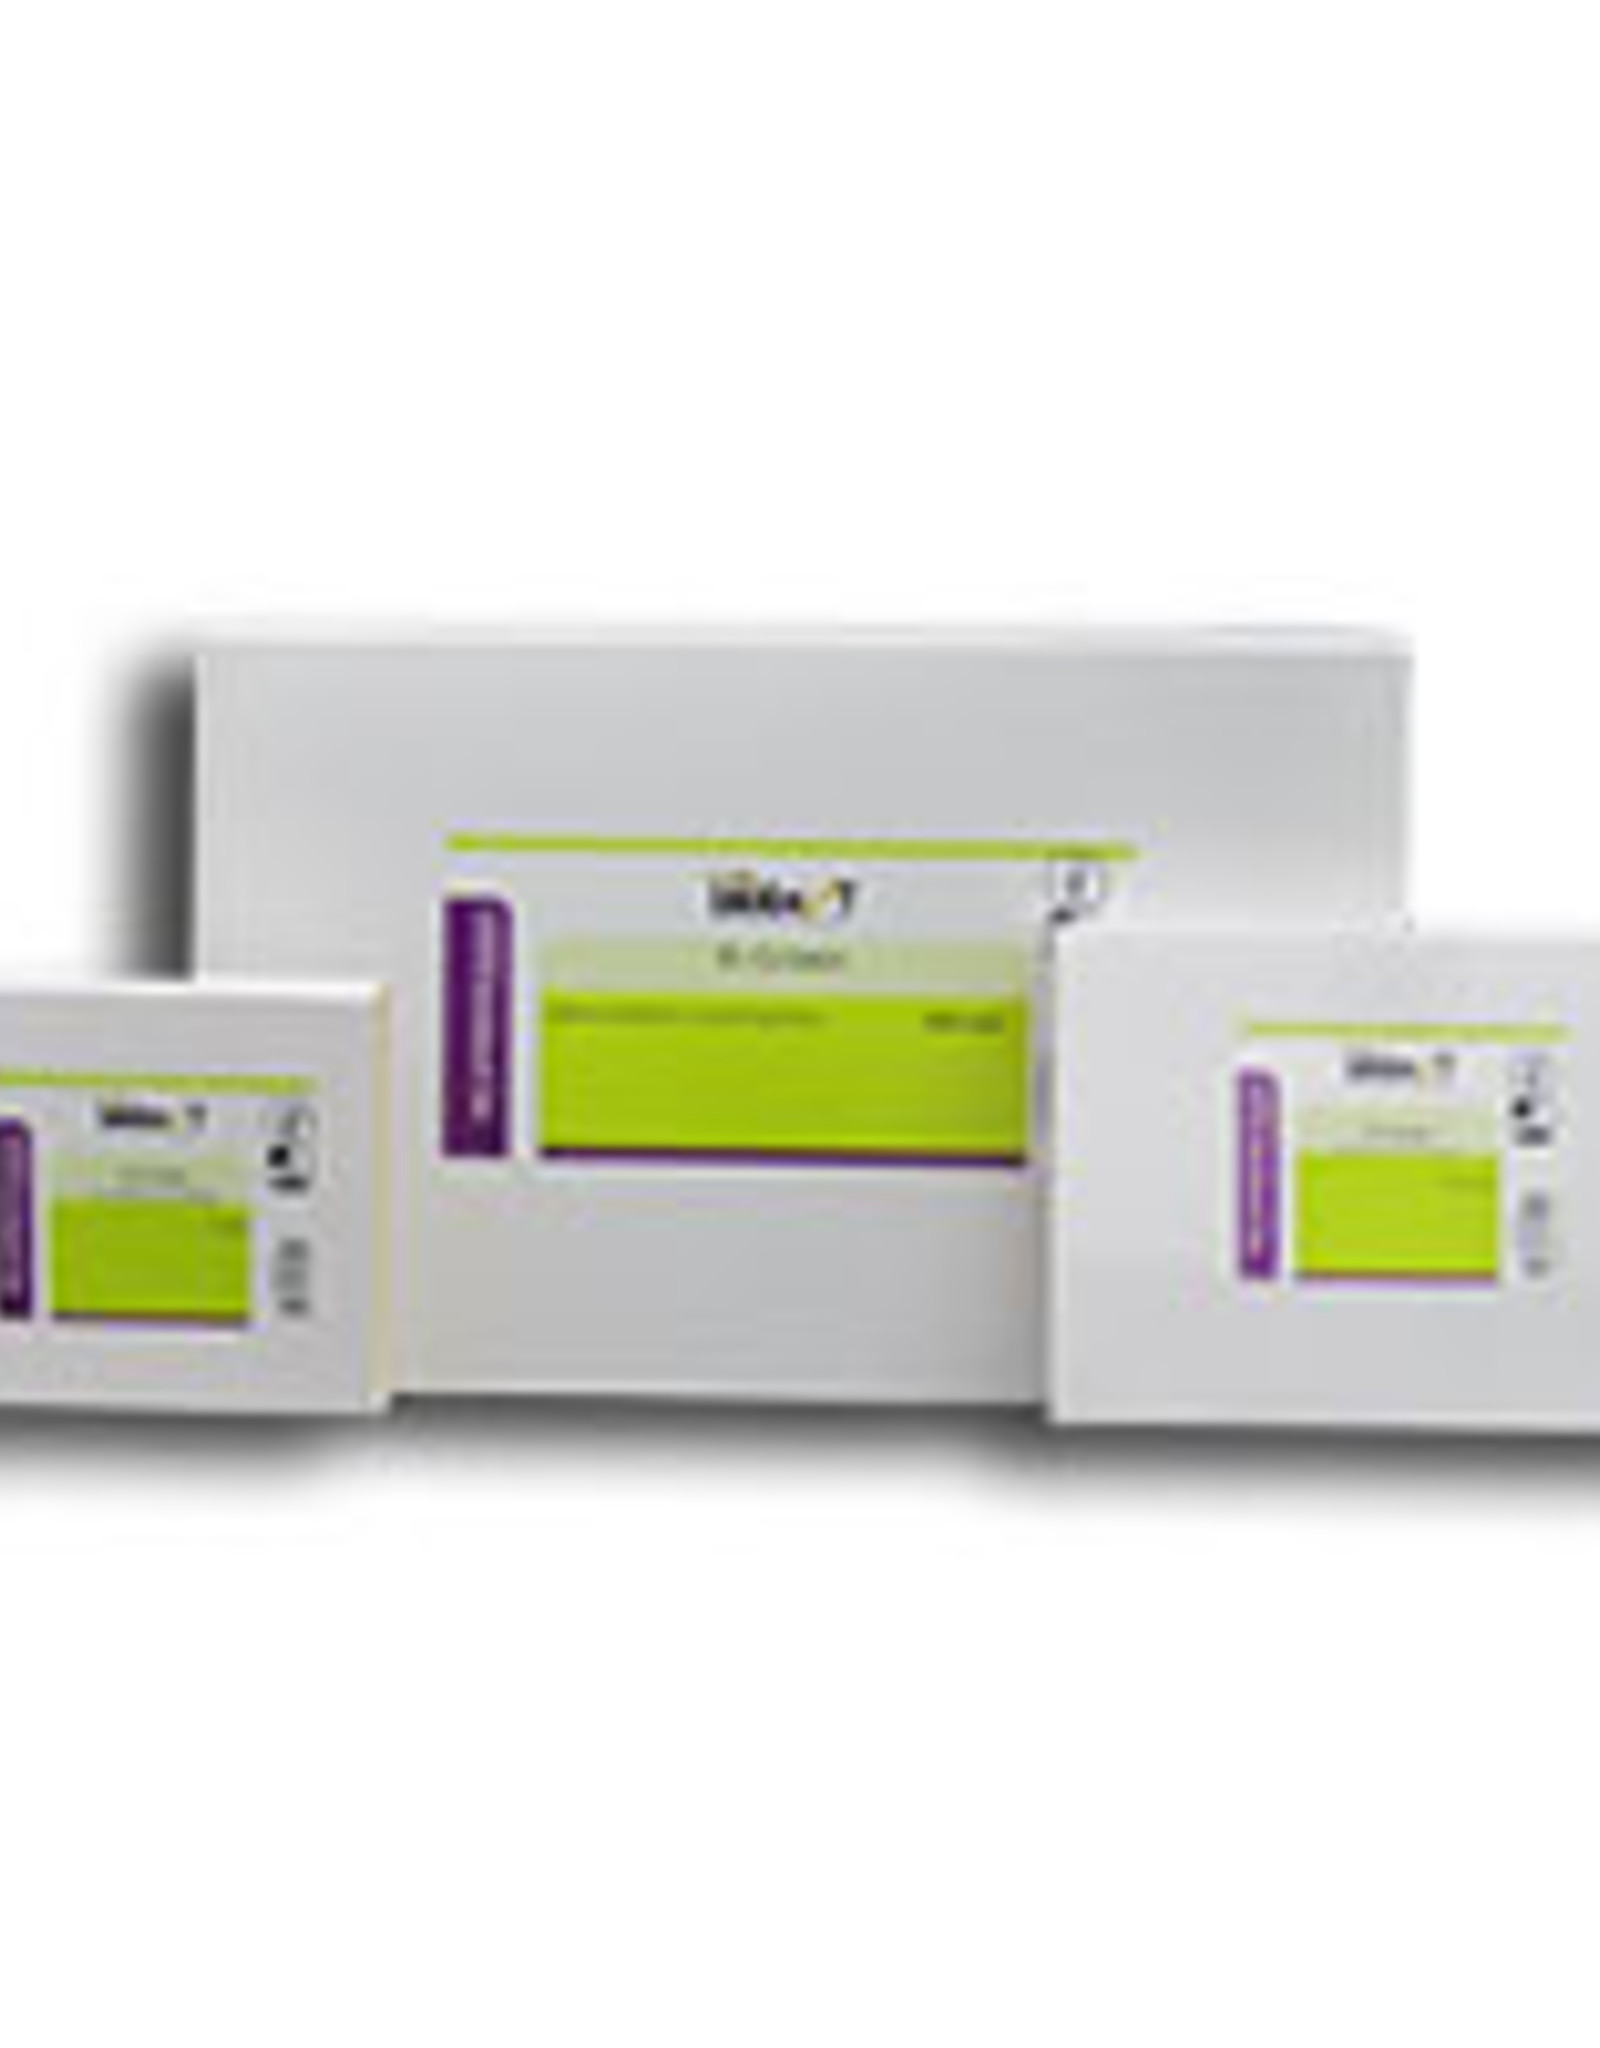 Brimex Biobest Meikever bestrijden met aaltjes Brimex B-Green